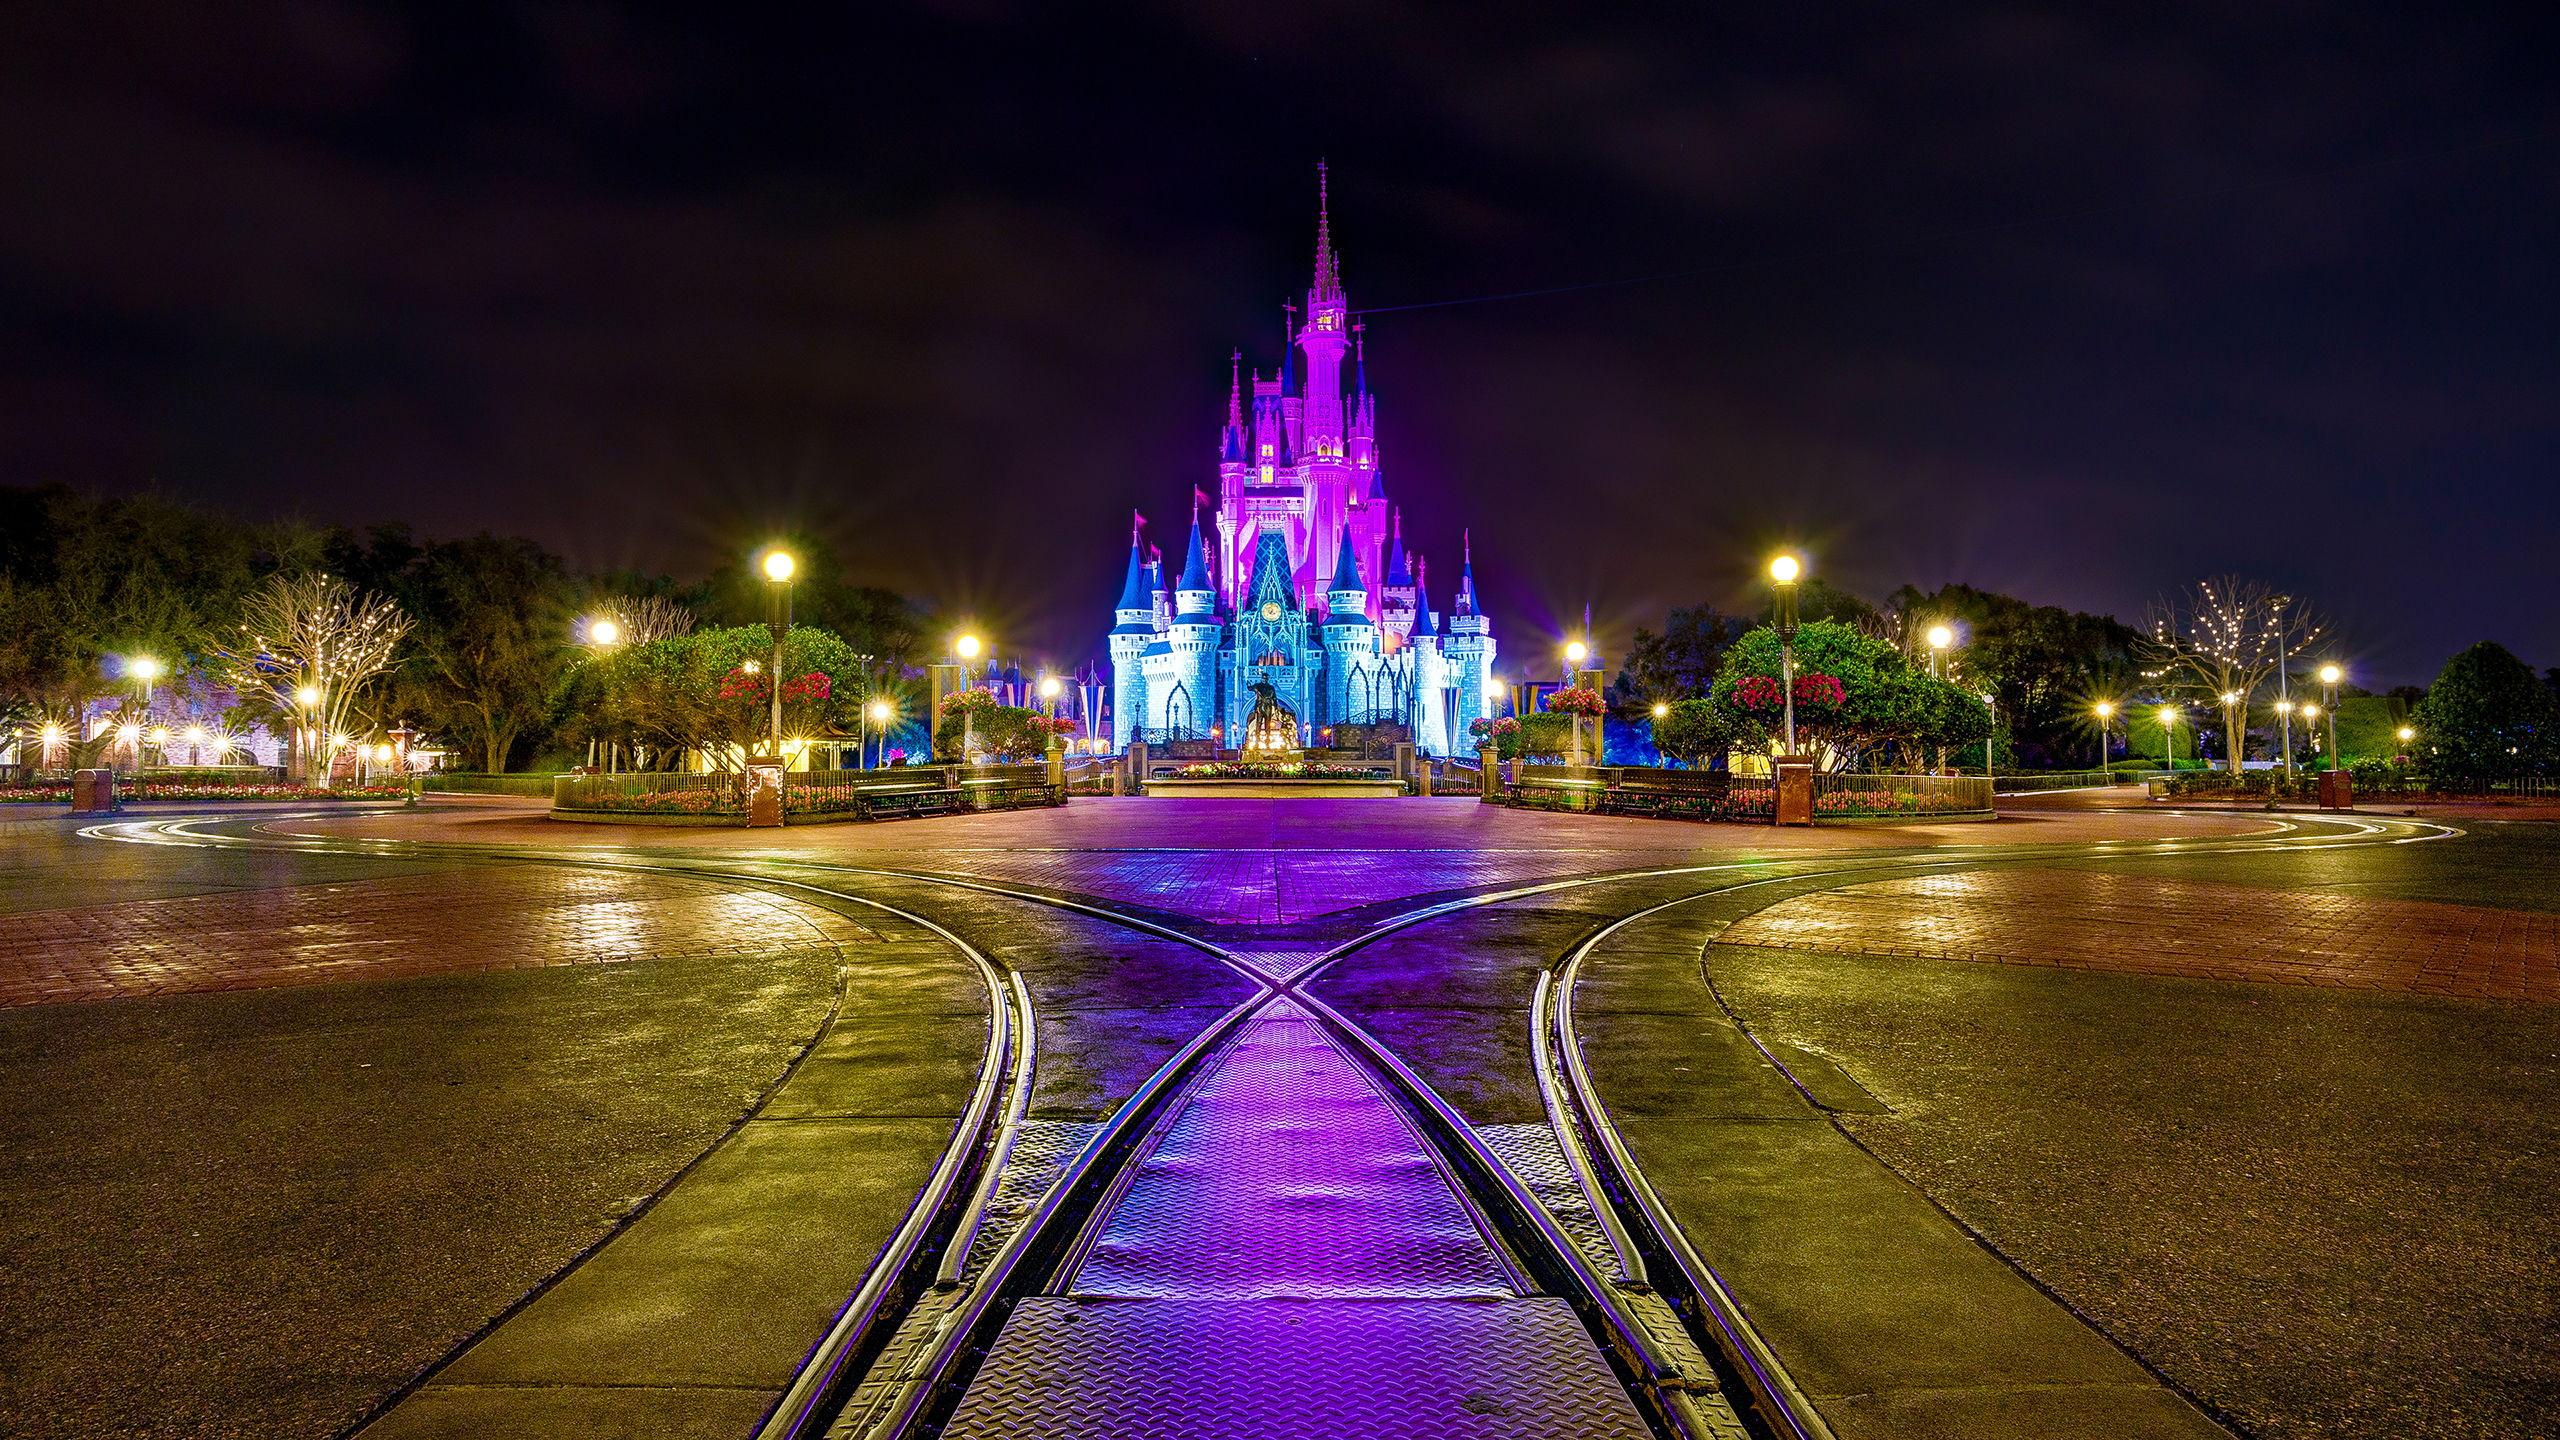 Disneyland HD Wallpapers 2560x1440